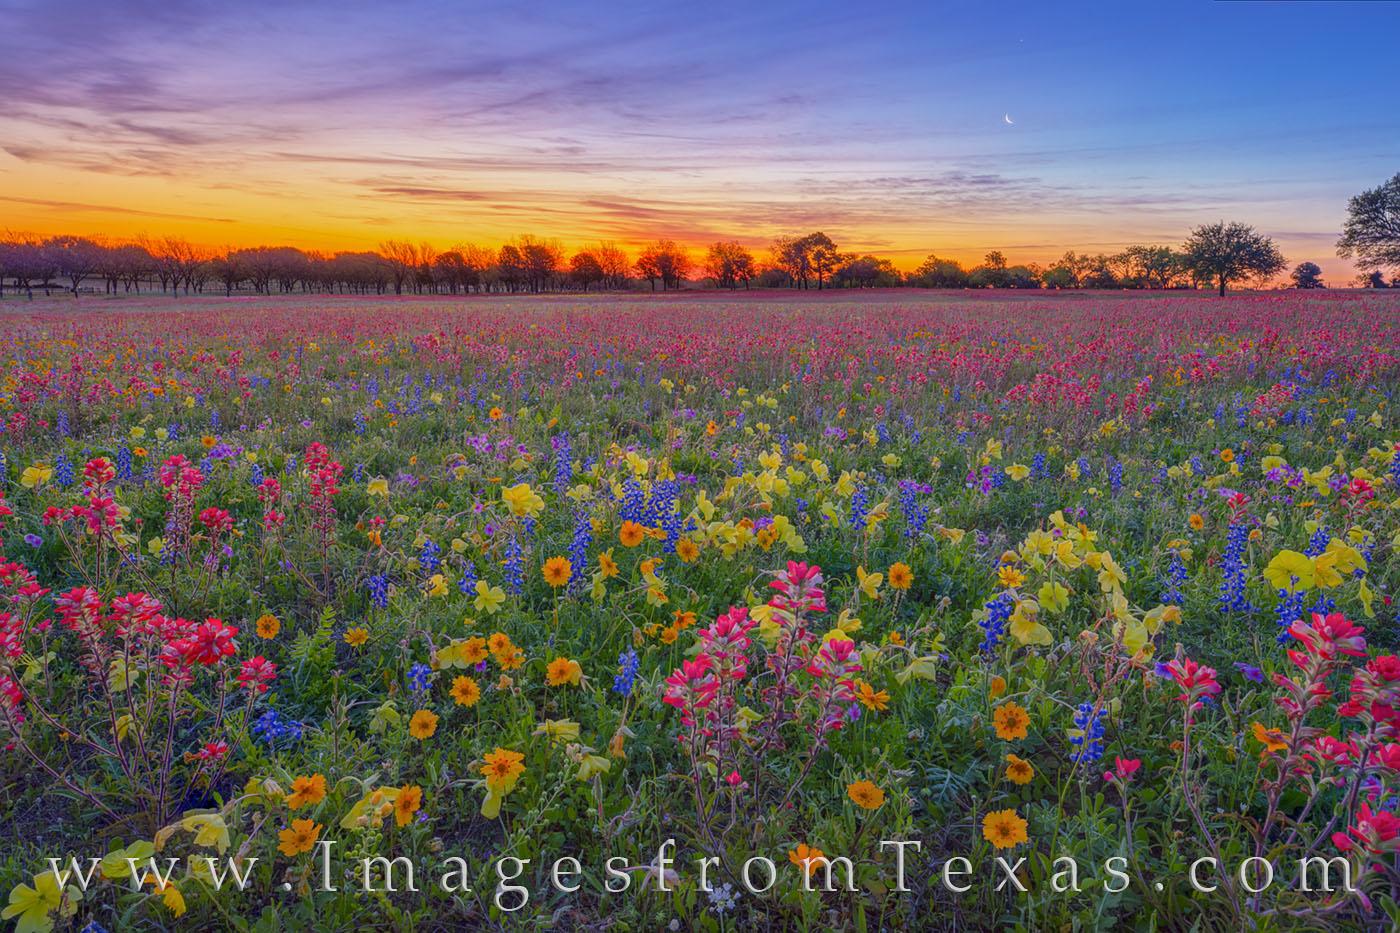 Wildflowers, bluebonnets, tickseed, coreopsis, phlox, primrose, paintbrush, new berlin, church road, single oak road, rural, spring, sunrise, morning, frost, cold, calm, April, photo